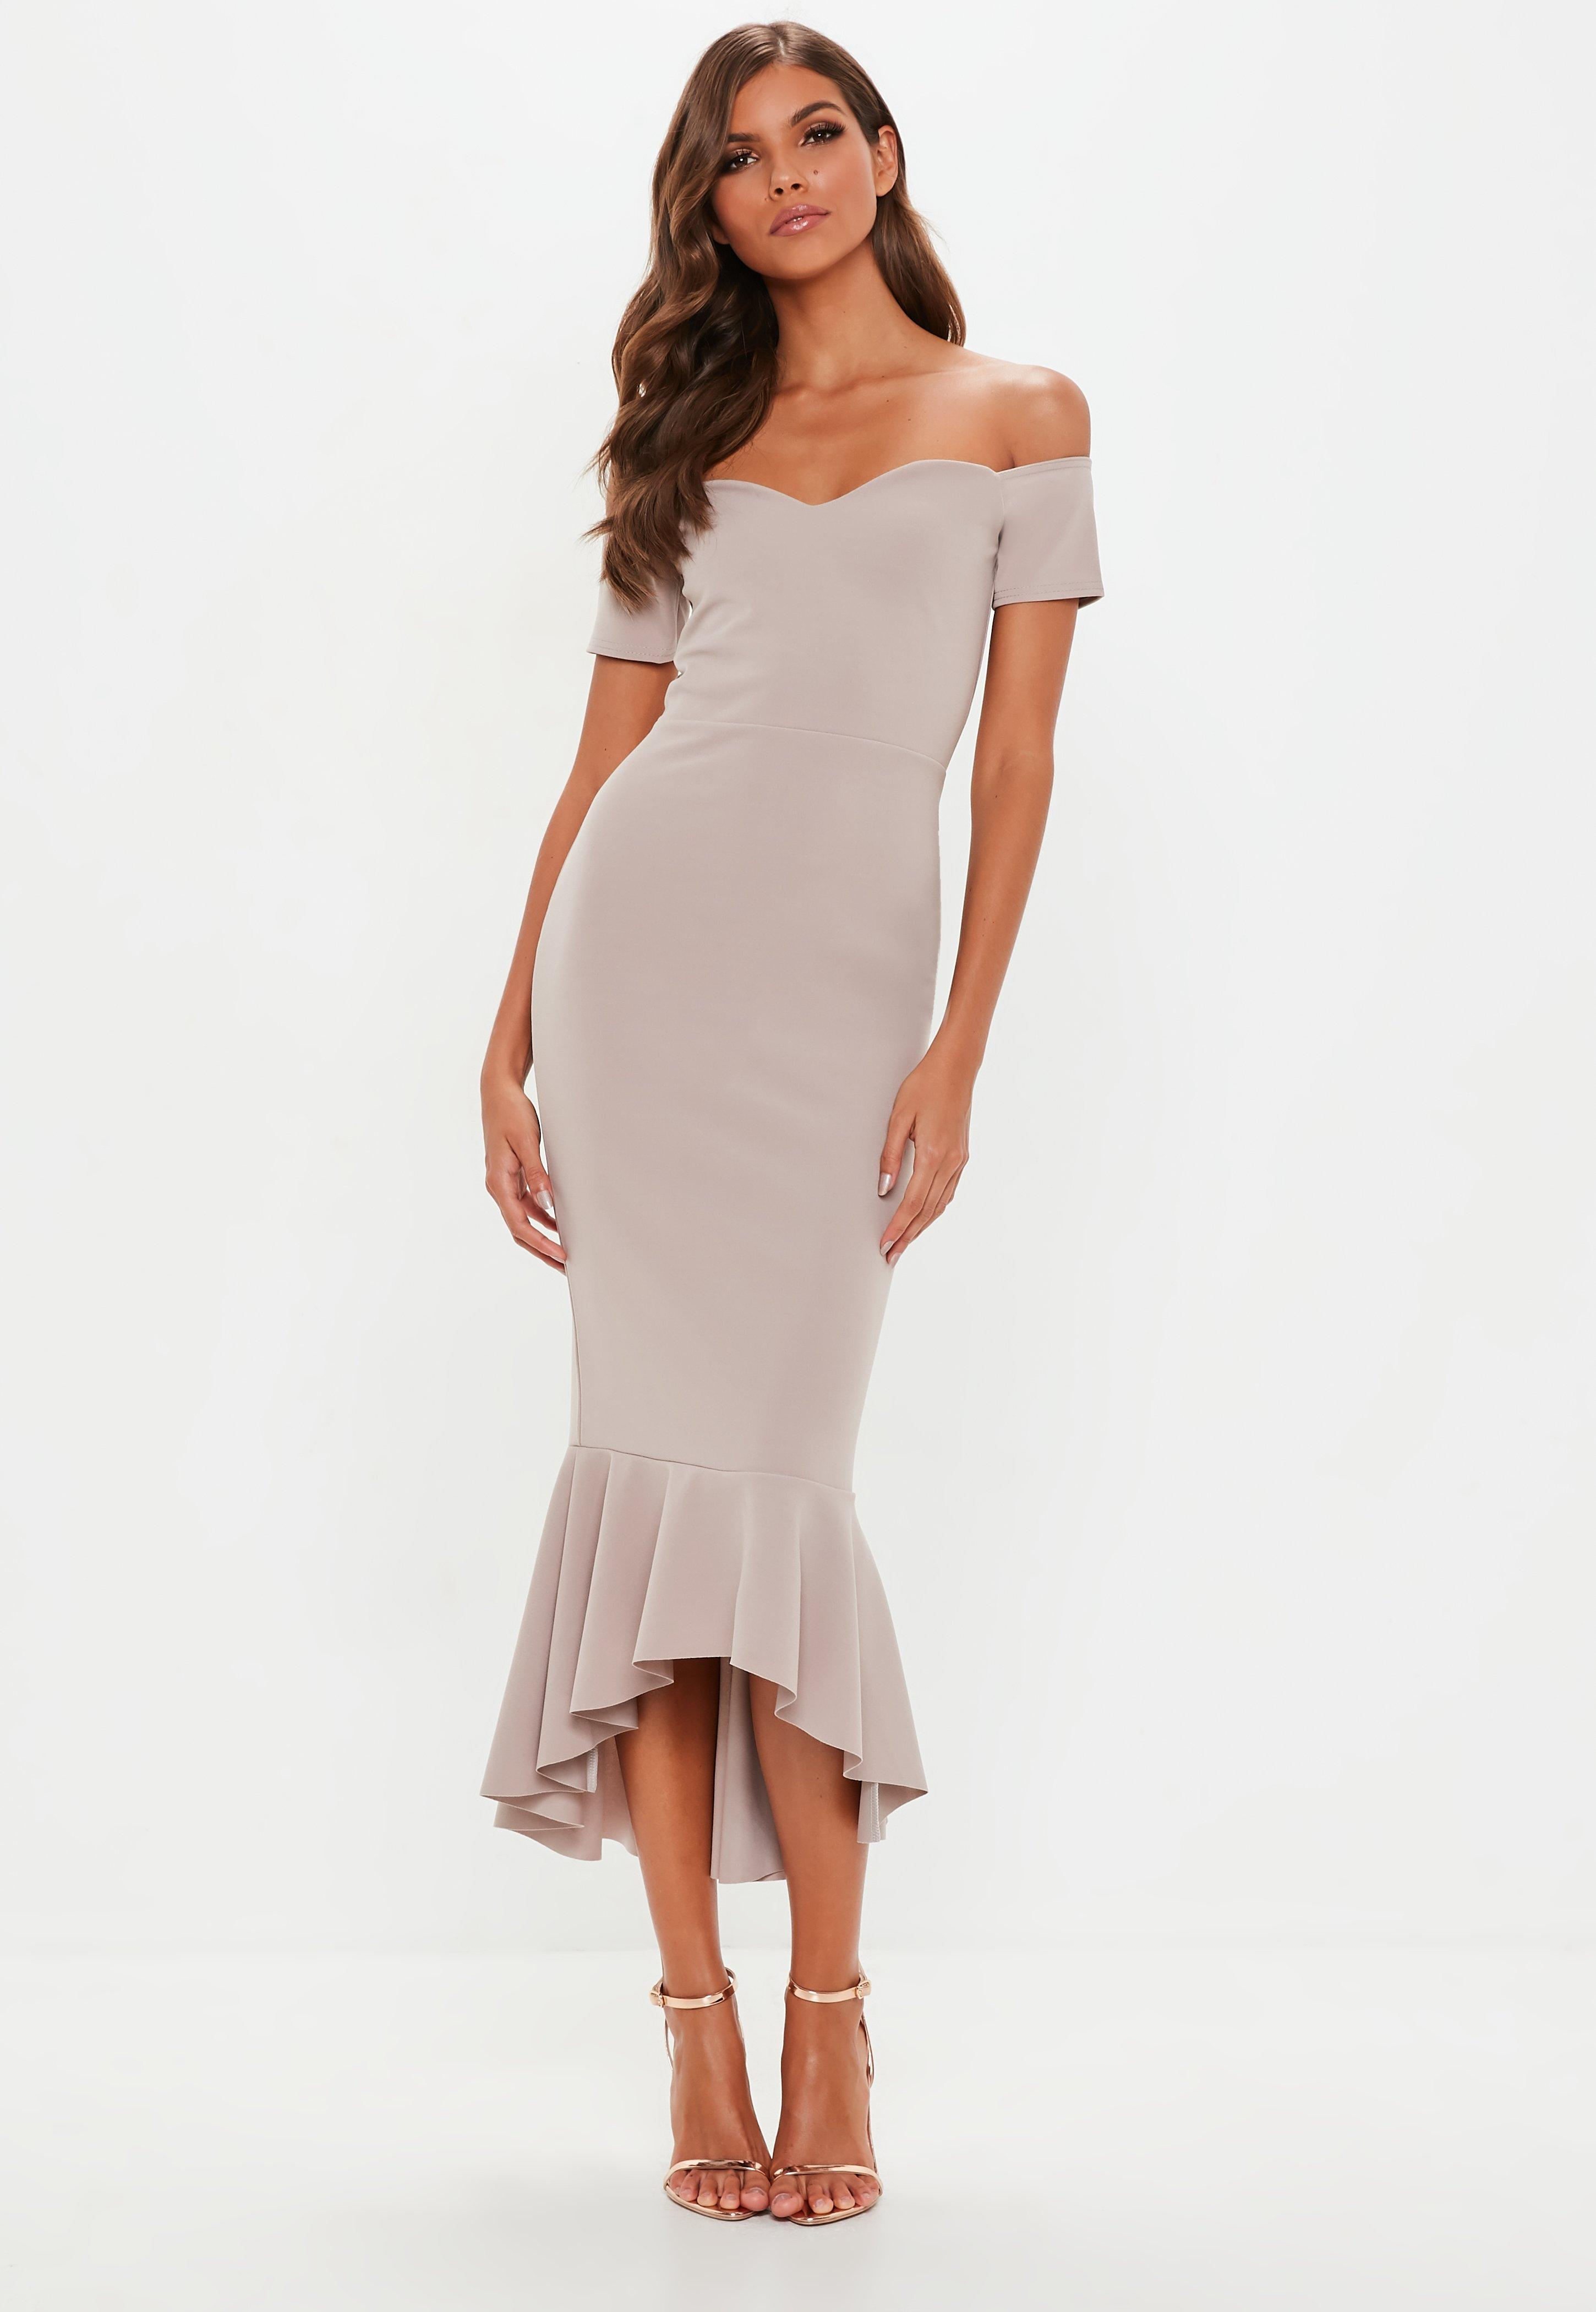 Prom Dresses 2018 | Long & Short Dance Dresses - Missguided